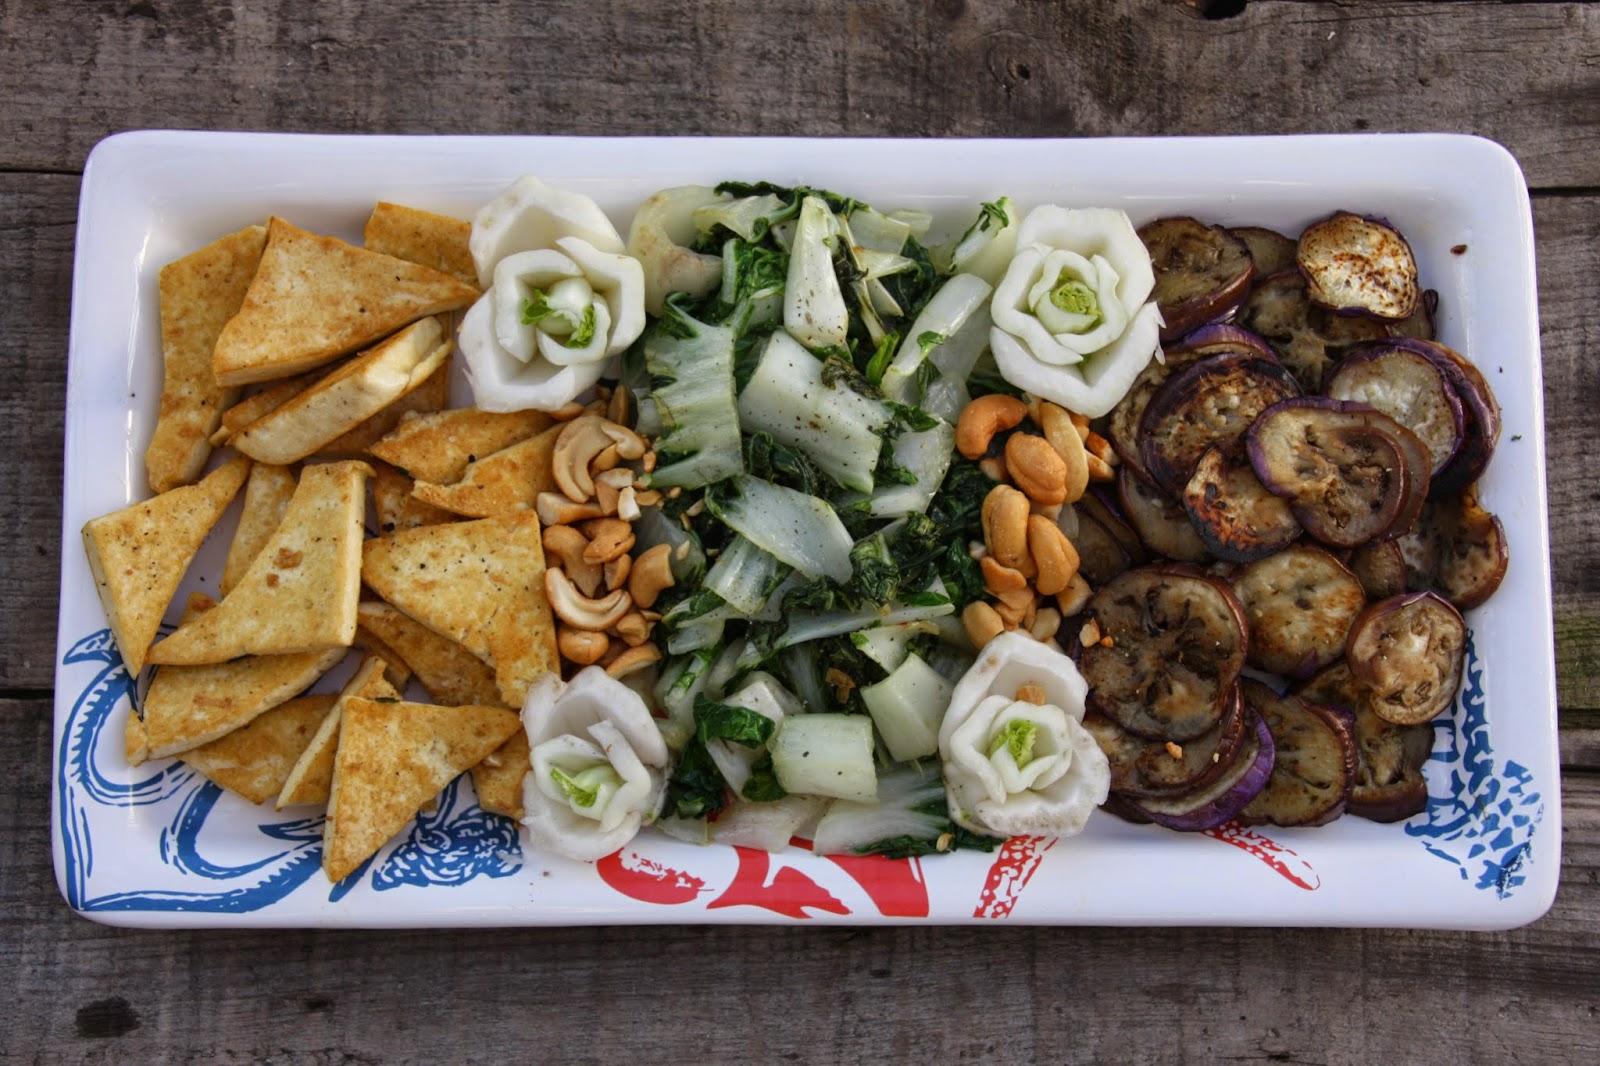 Tofu, bok choy, eggplant and cashew platter